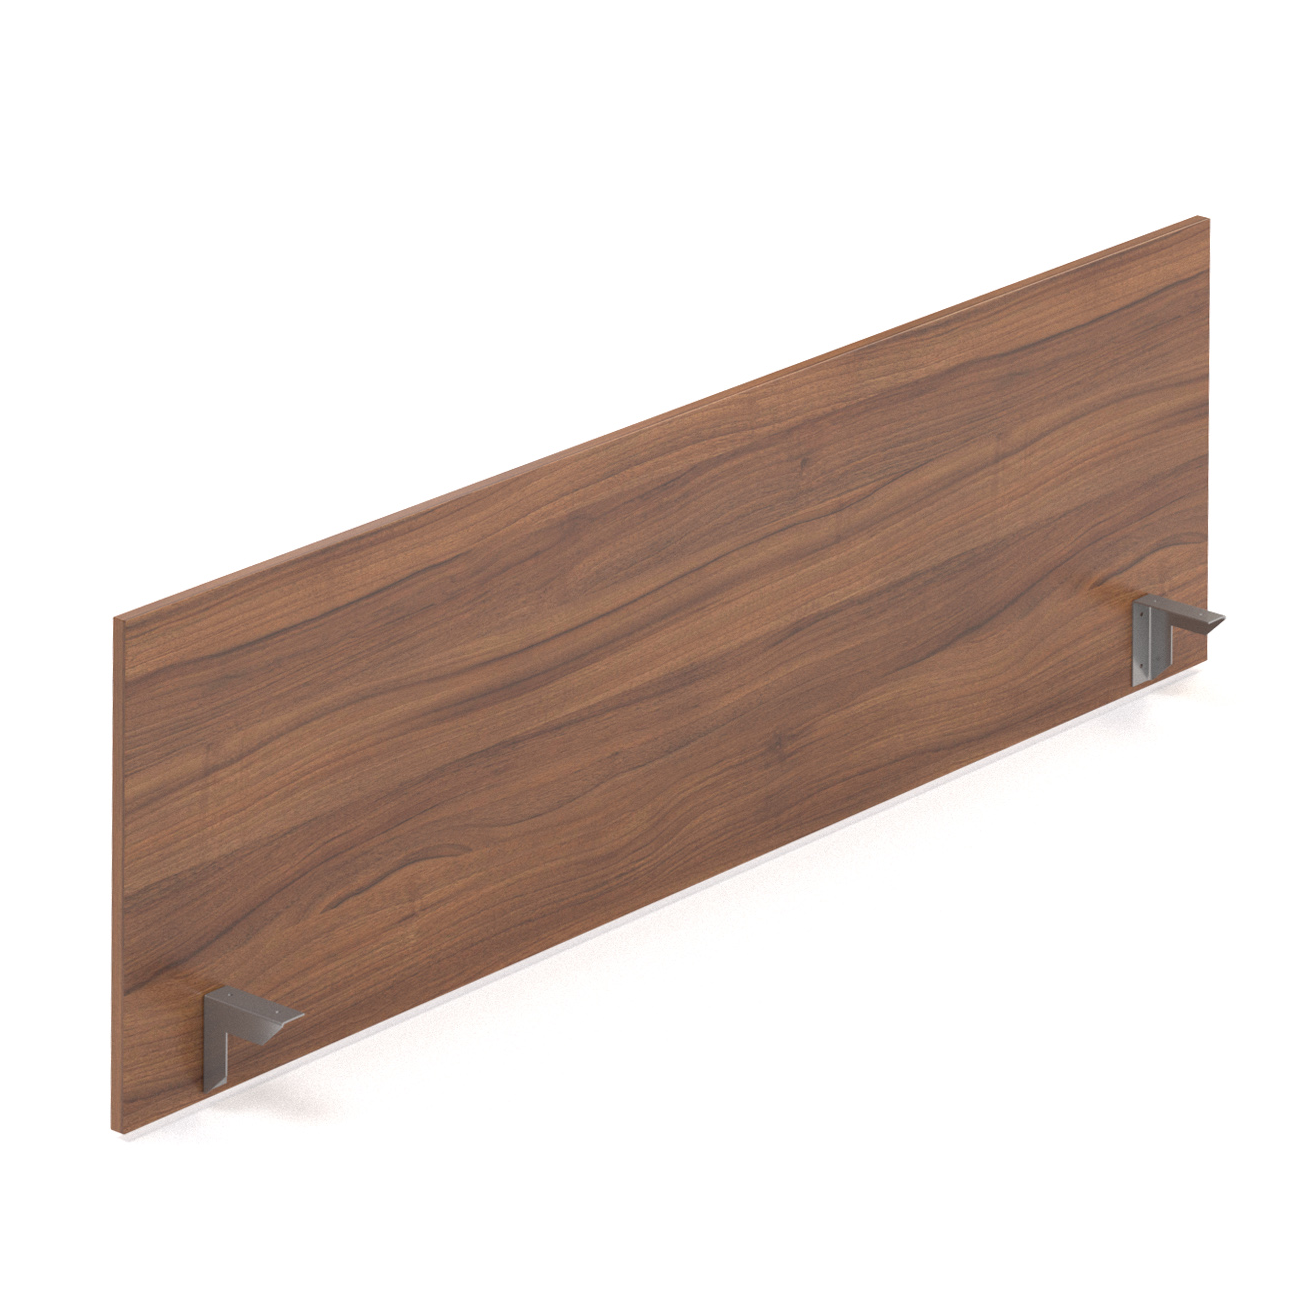 Deliaci panel Komfort 160x49 cm - PD16 19